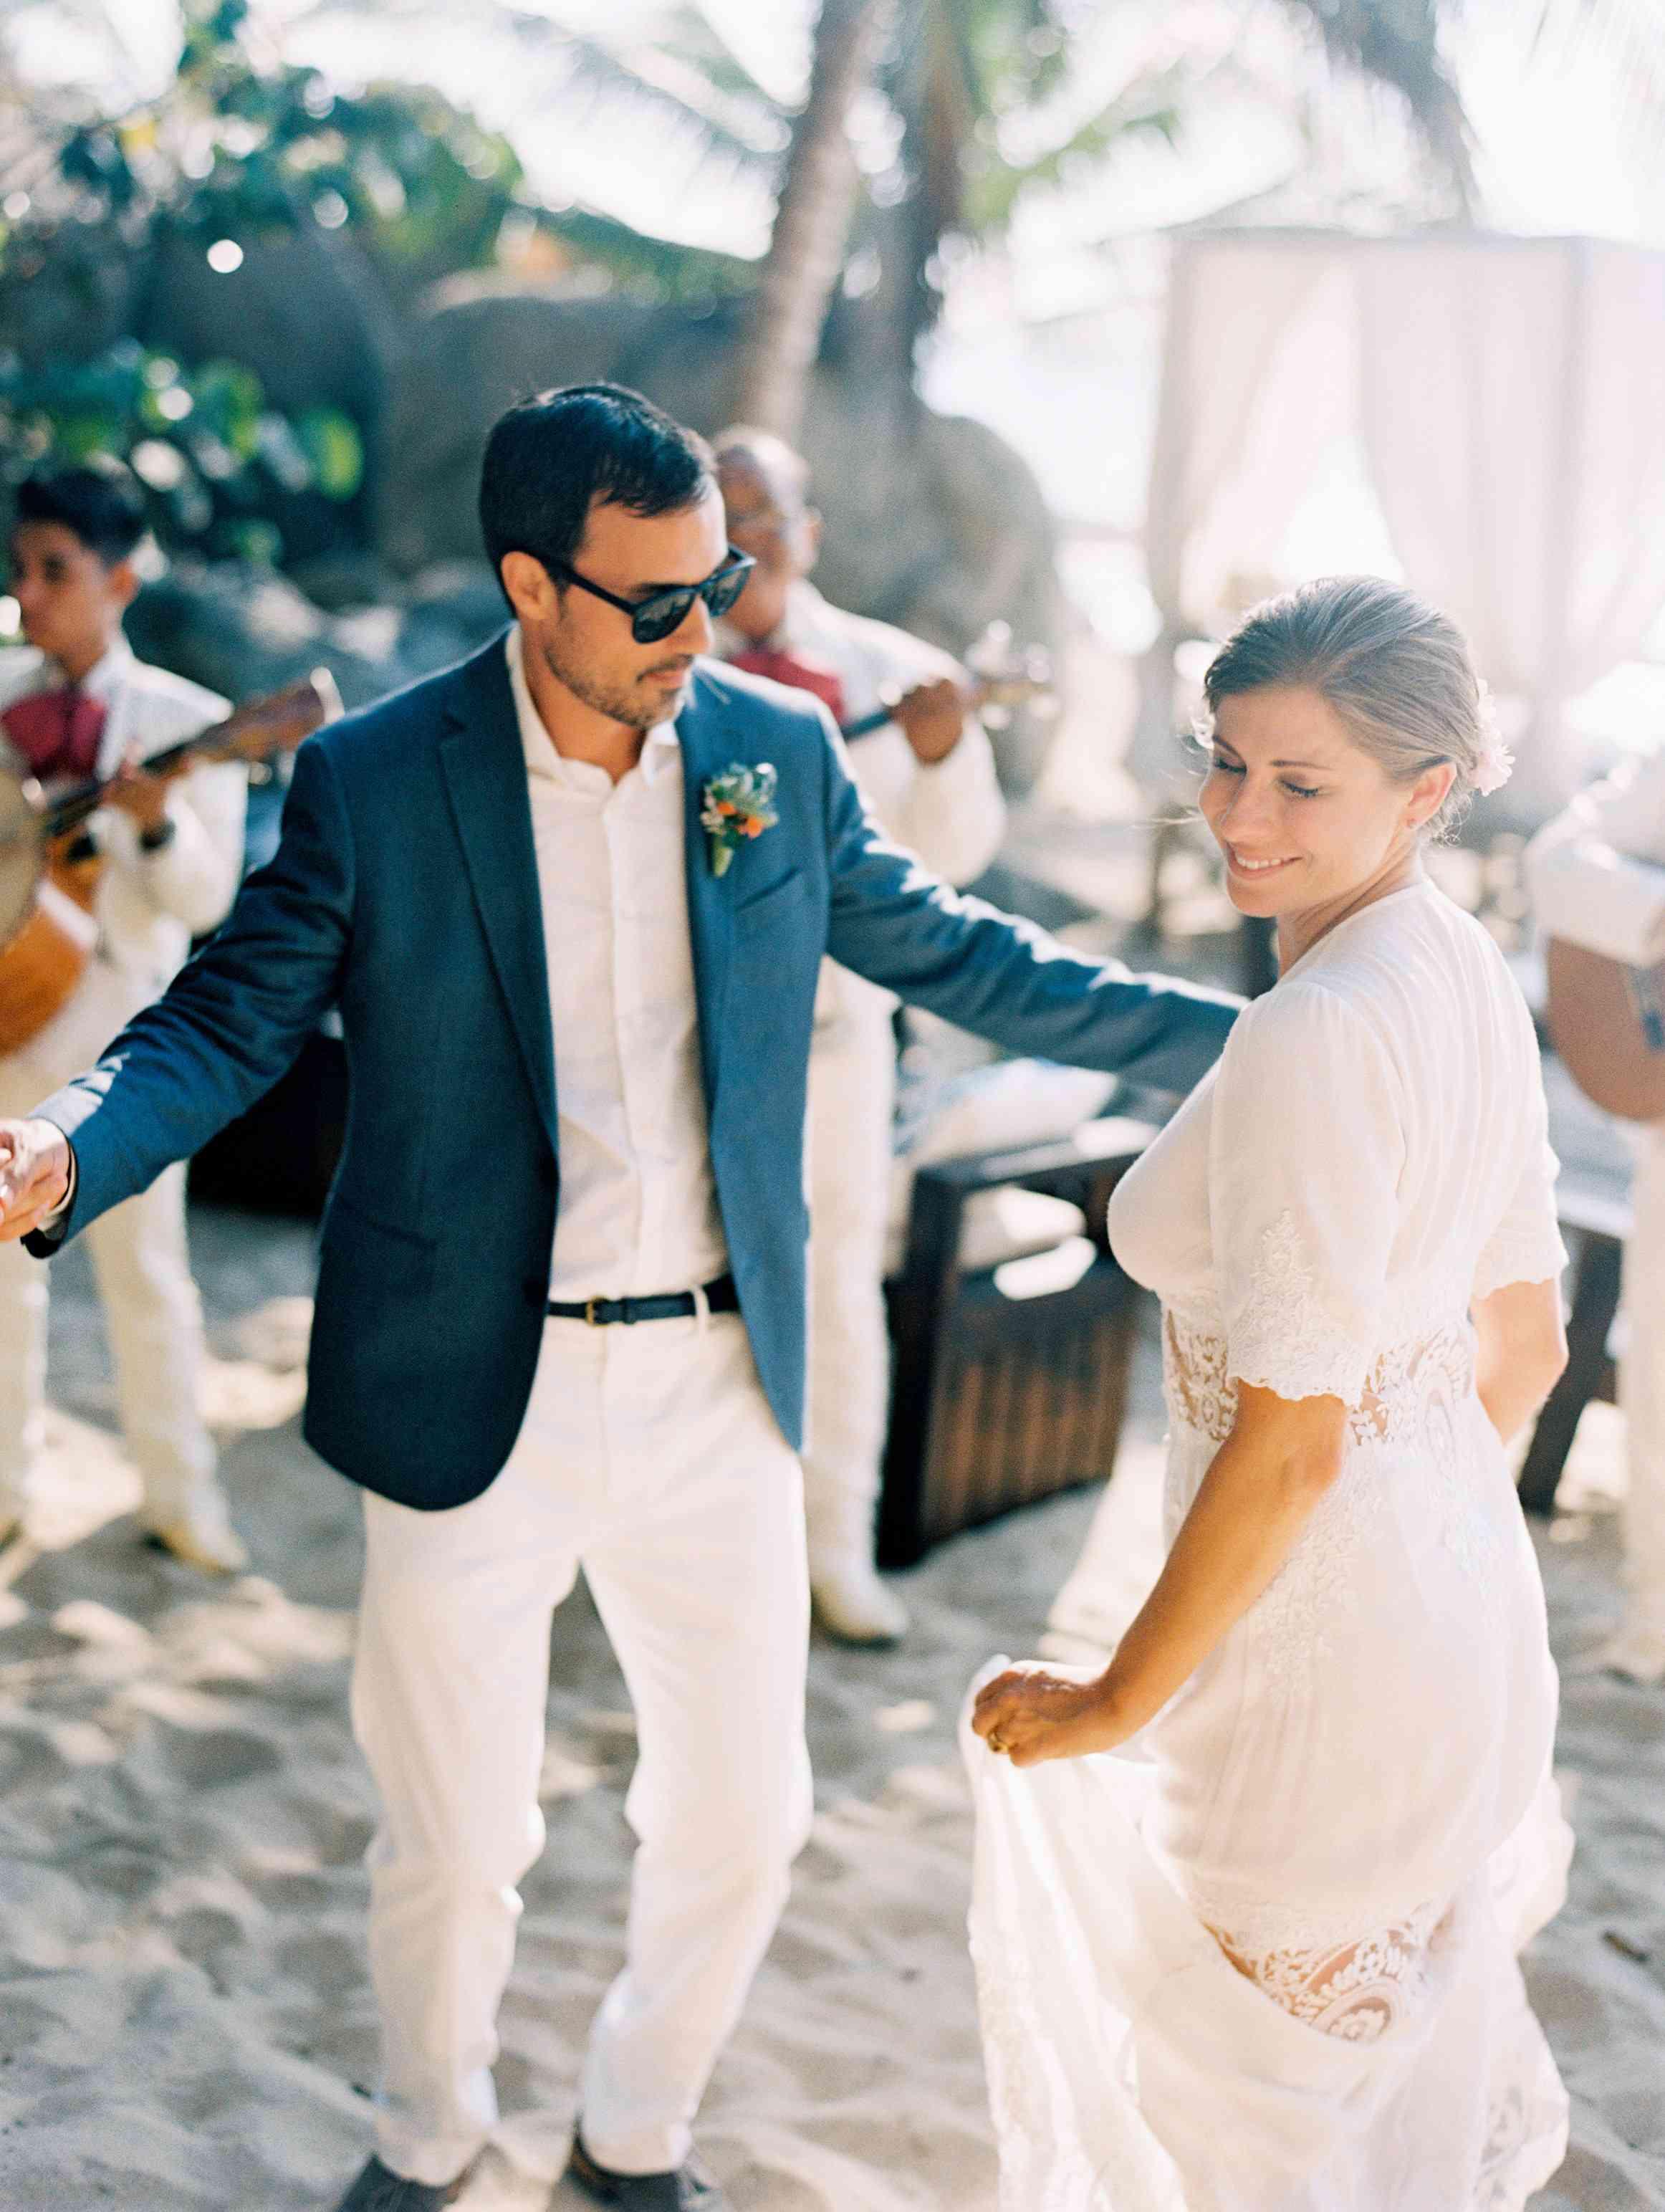 Newlyweds dancing on beach